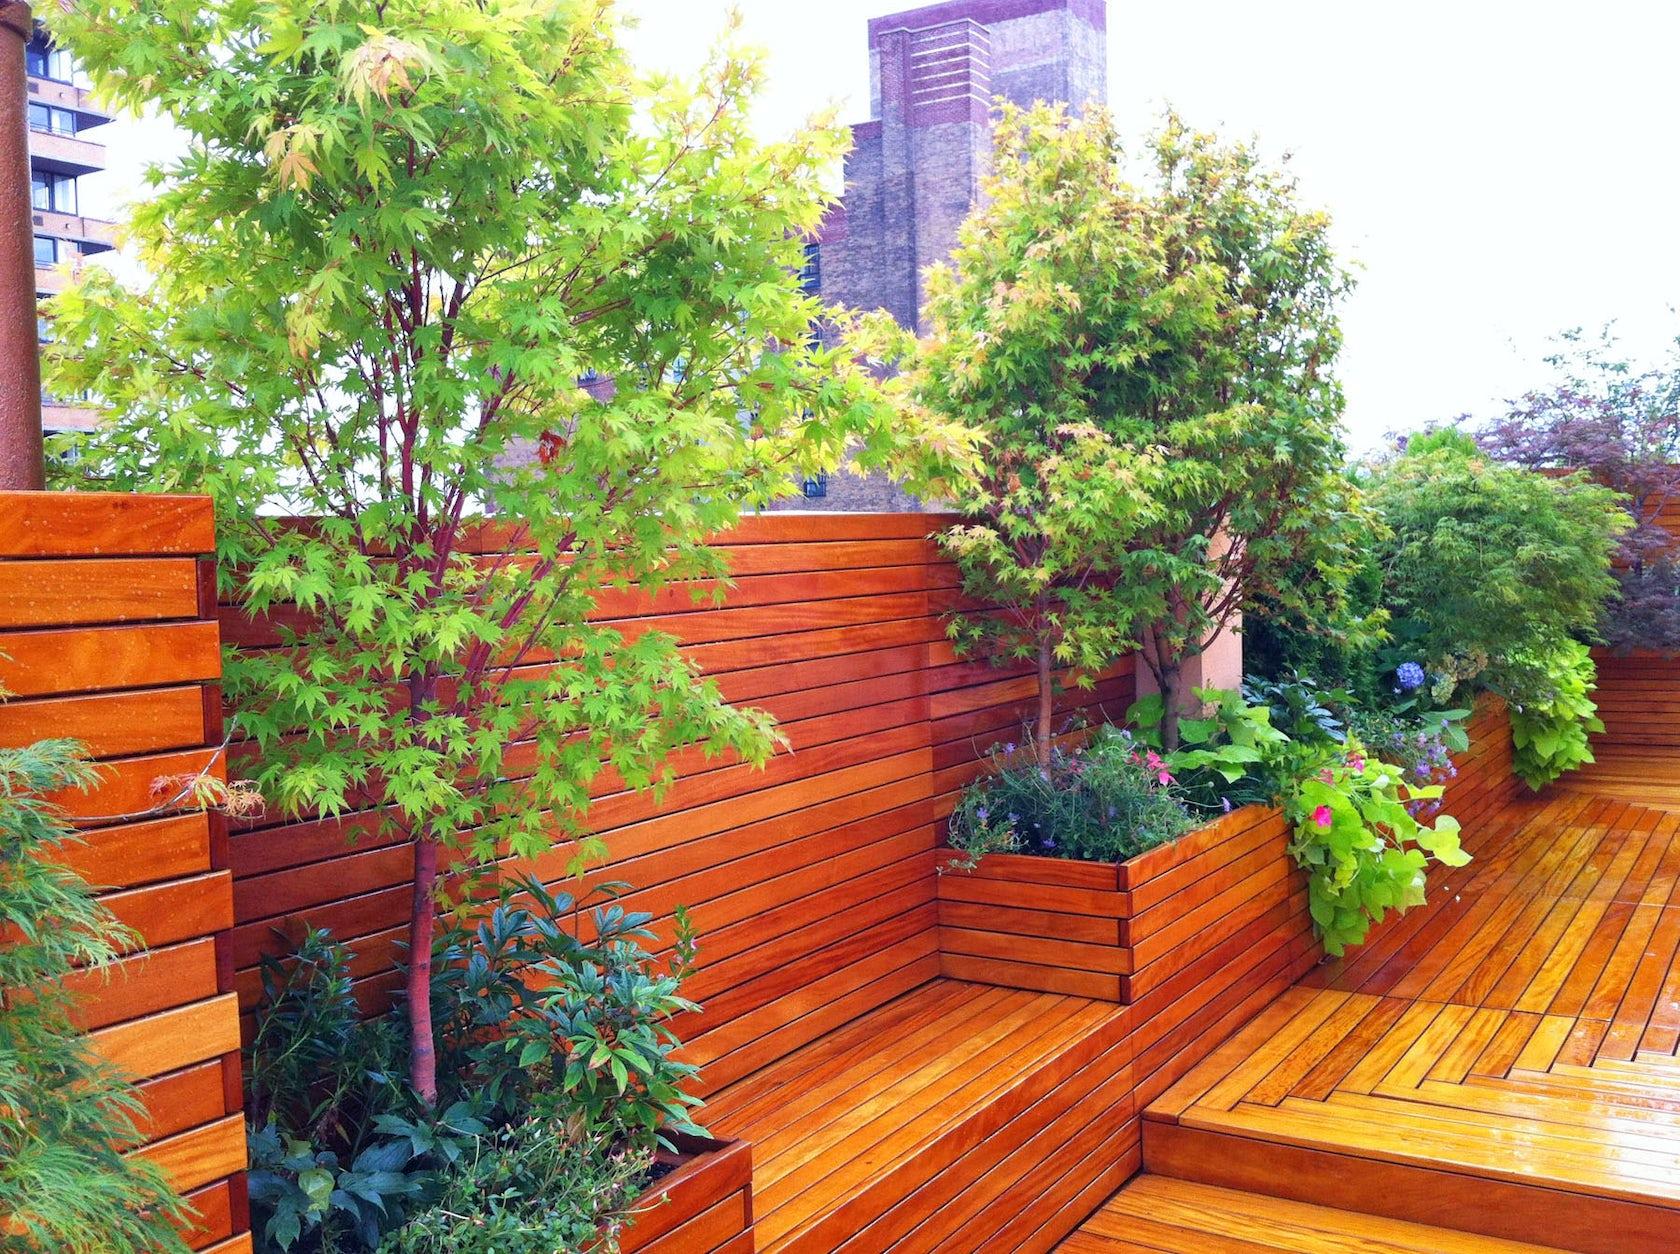 Nyc Roof Garden Design Yoga Studio Architizer